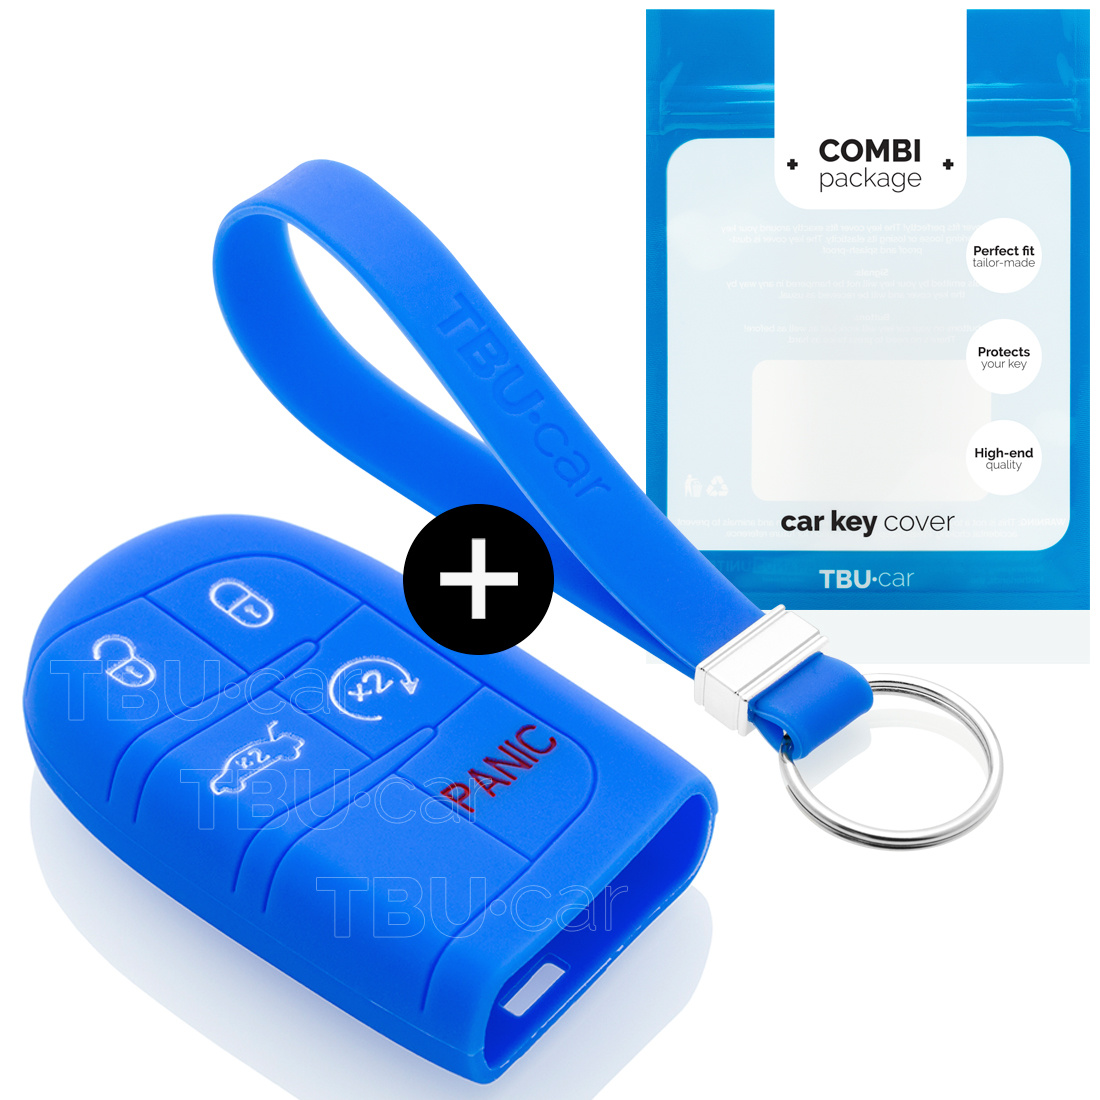 Jeep Autoschlüssel Hülle - Silikon Schutzhülle - Schlüsselhülle Cover - Blau